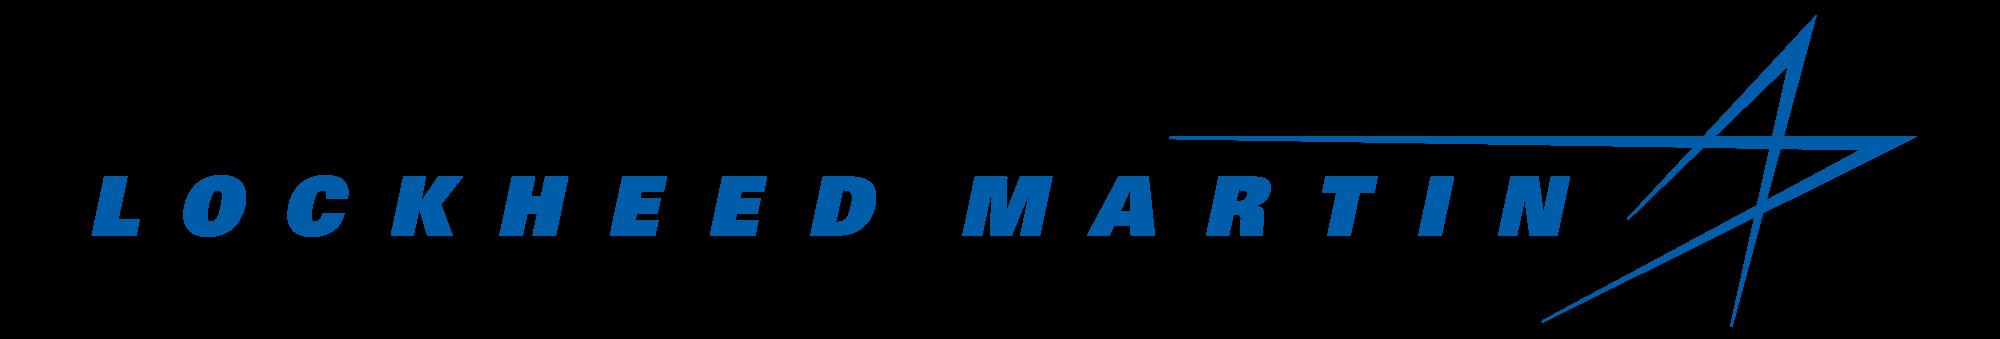 LockheedMartinLogo